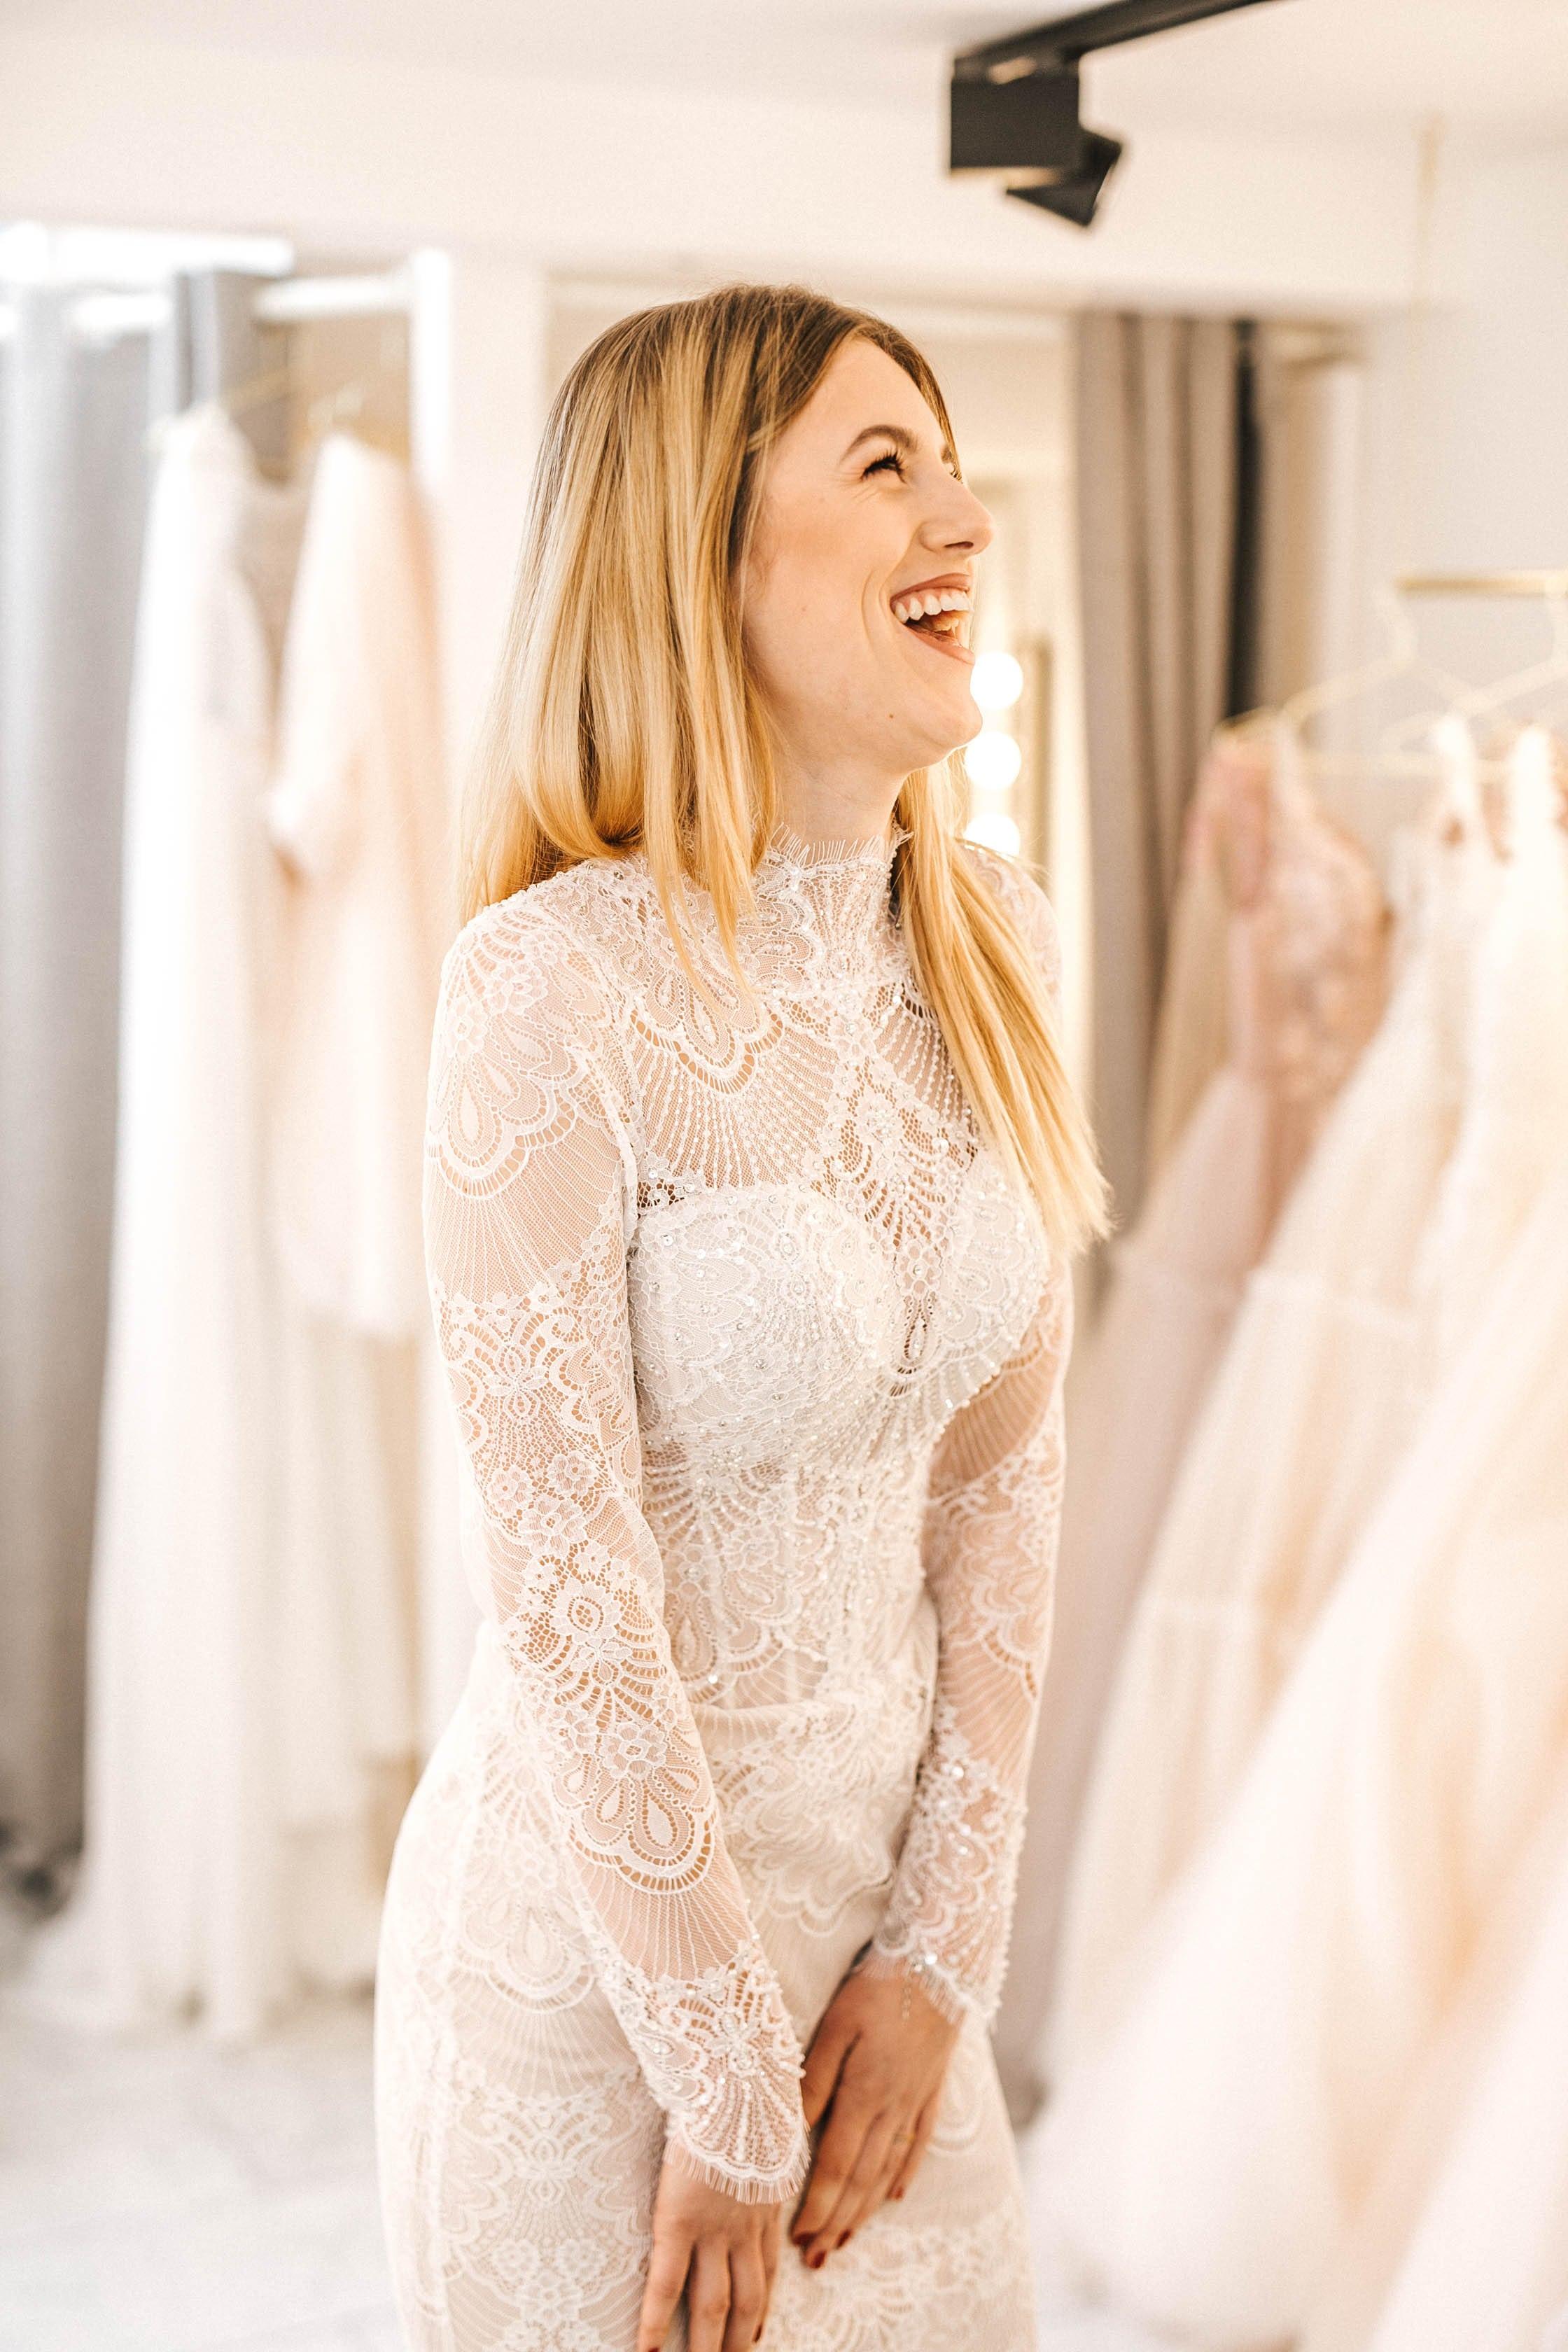 Jennifer Mastroianni Bridal beauty store 10 min